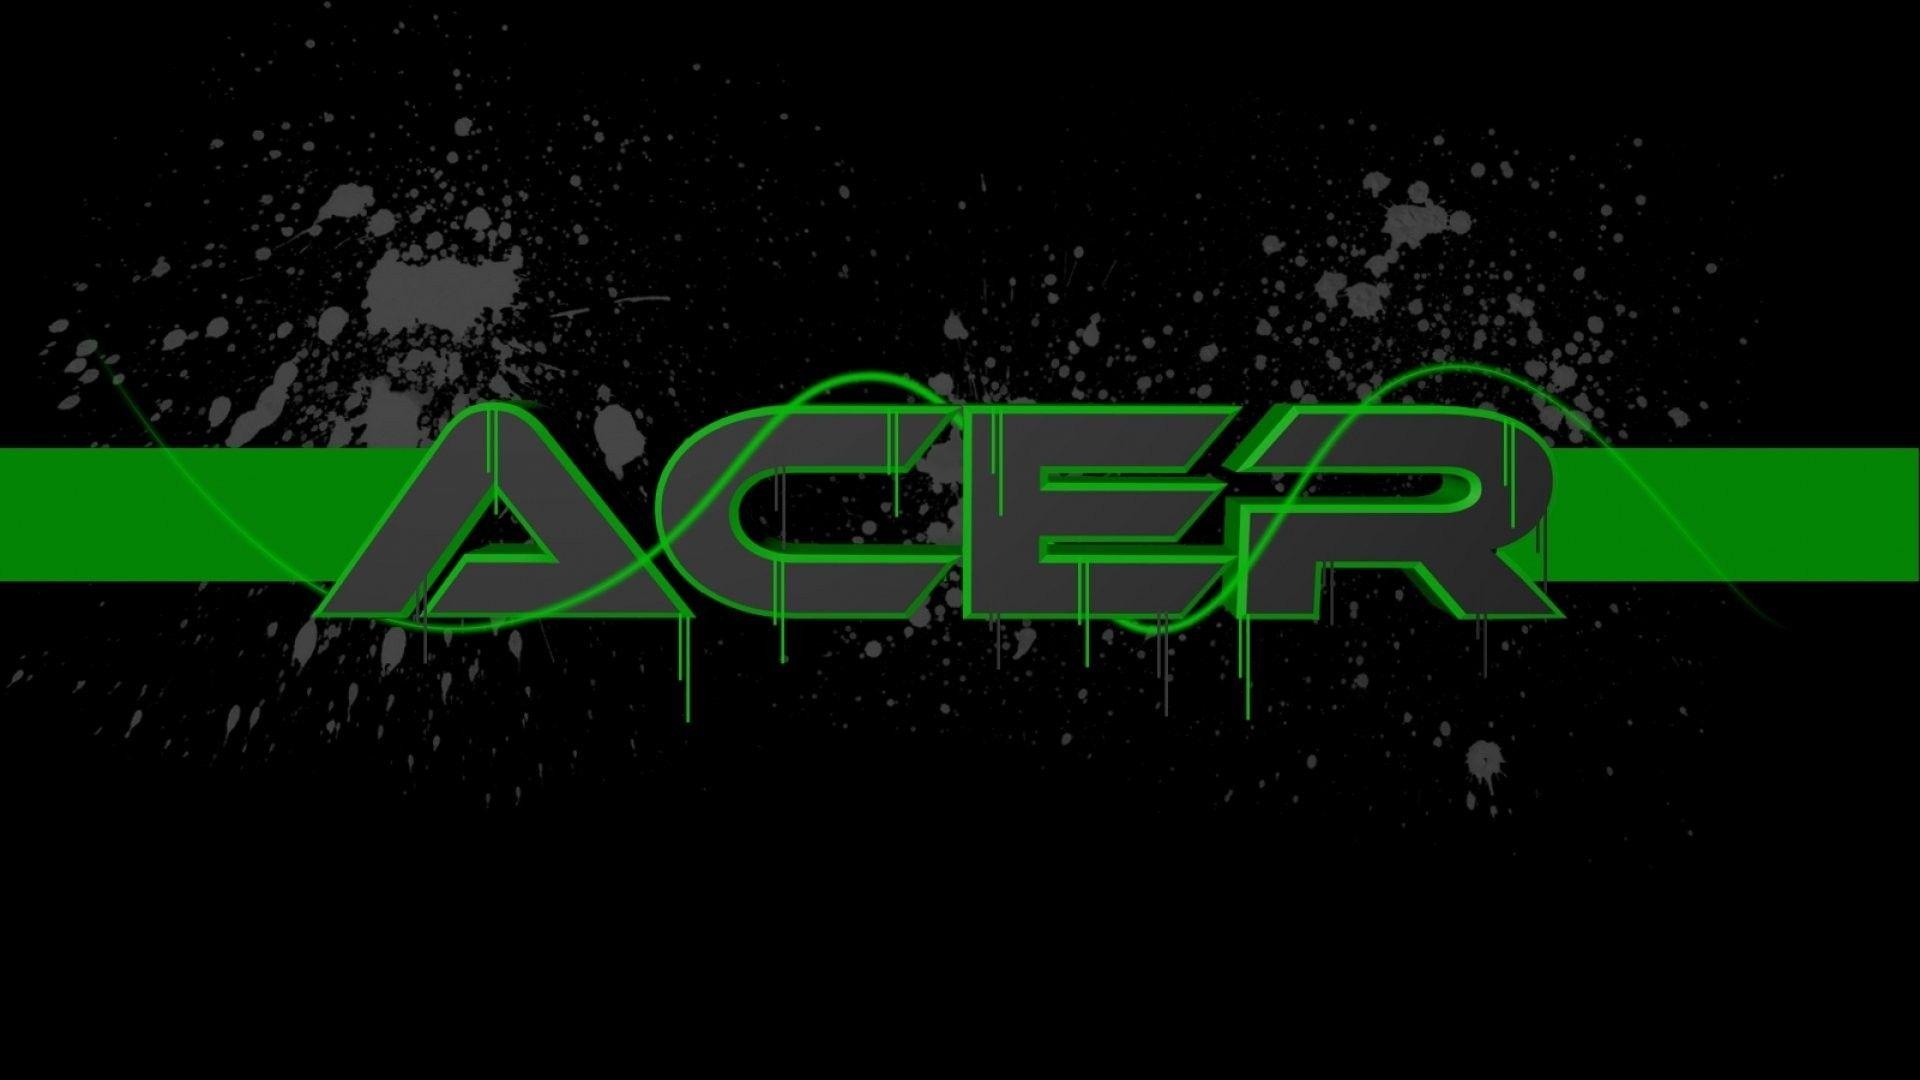 Acer Wallpaper P HD 1920x1080 Logo Wallpapers 35